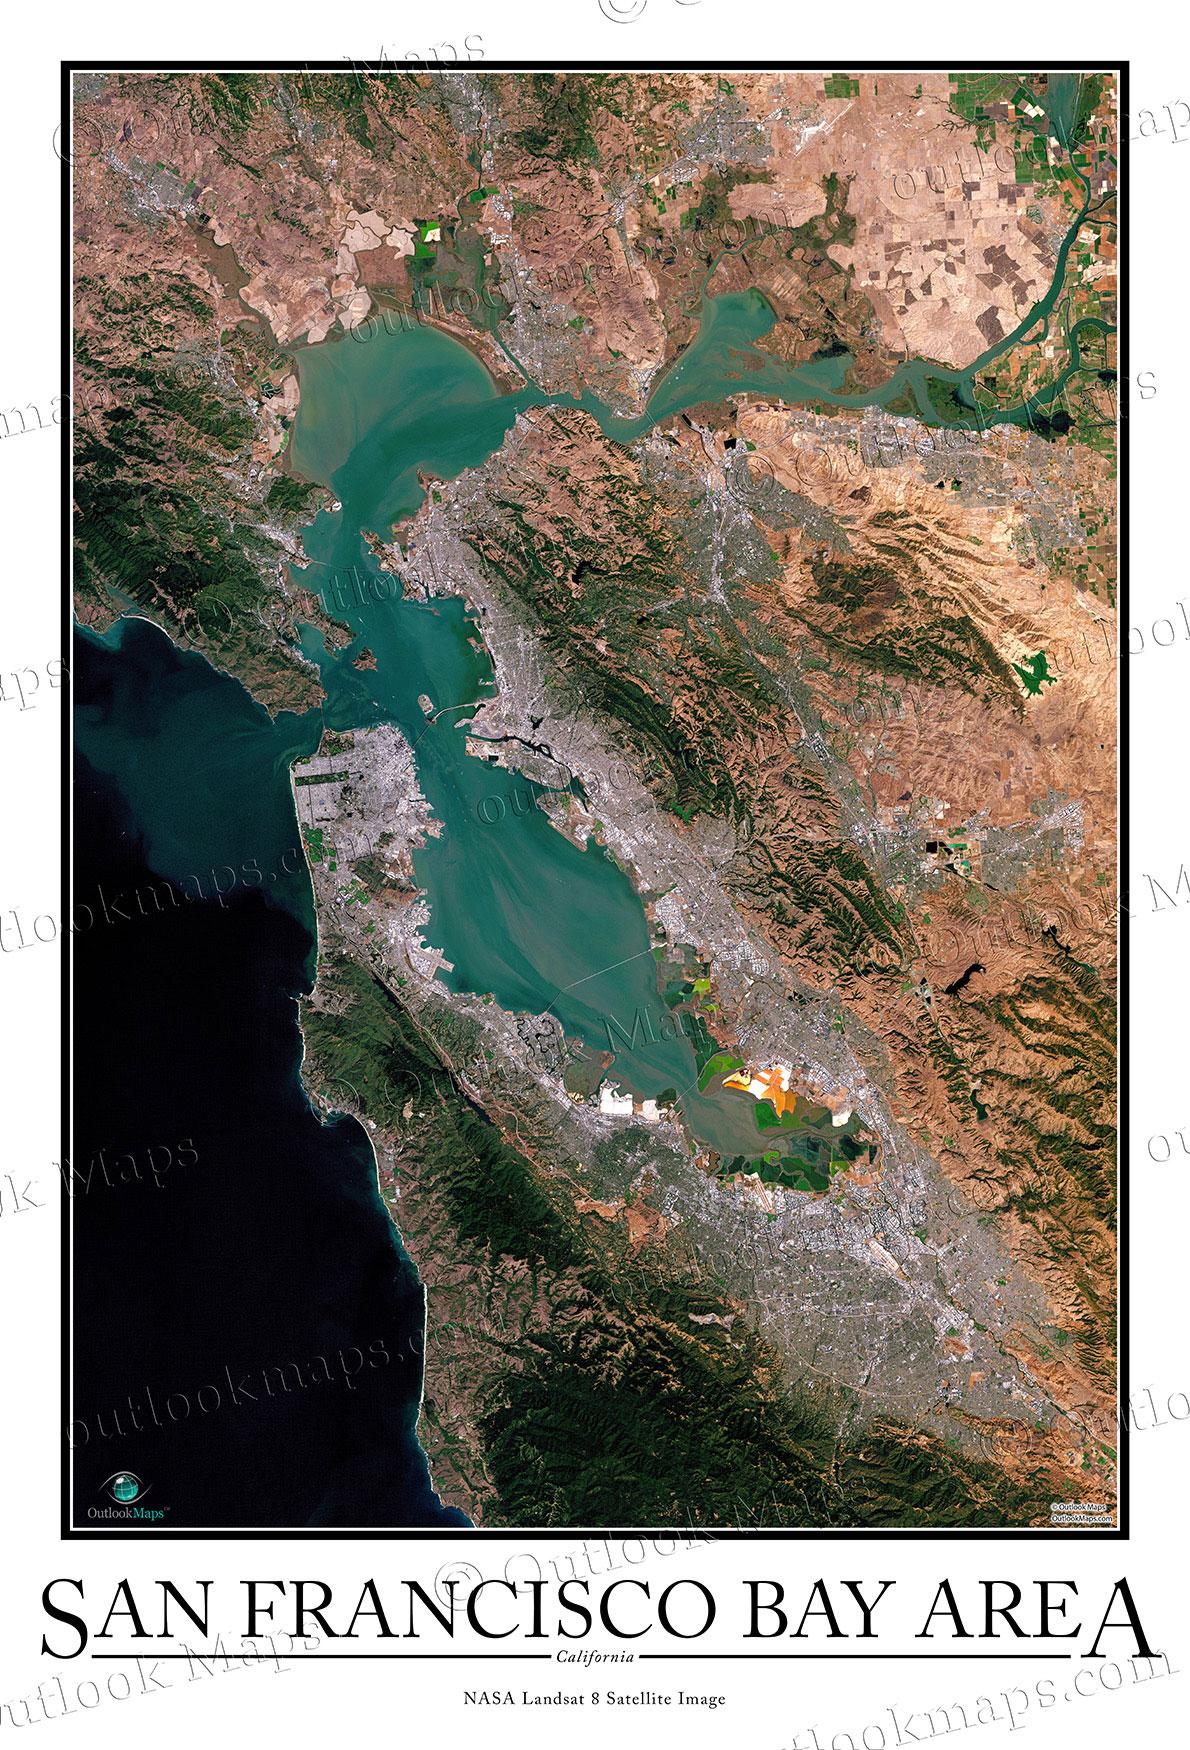 Seafood San Francisco Bay Area